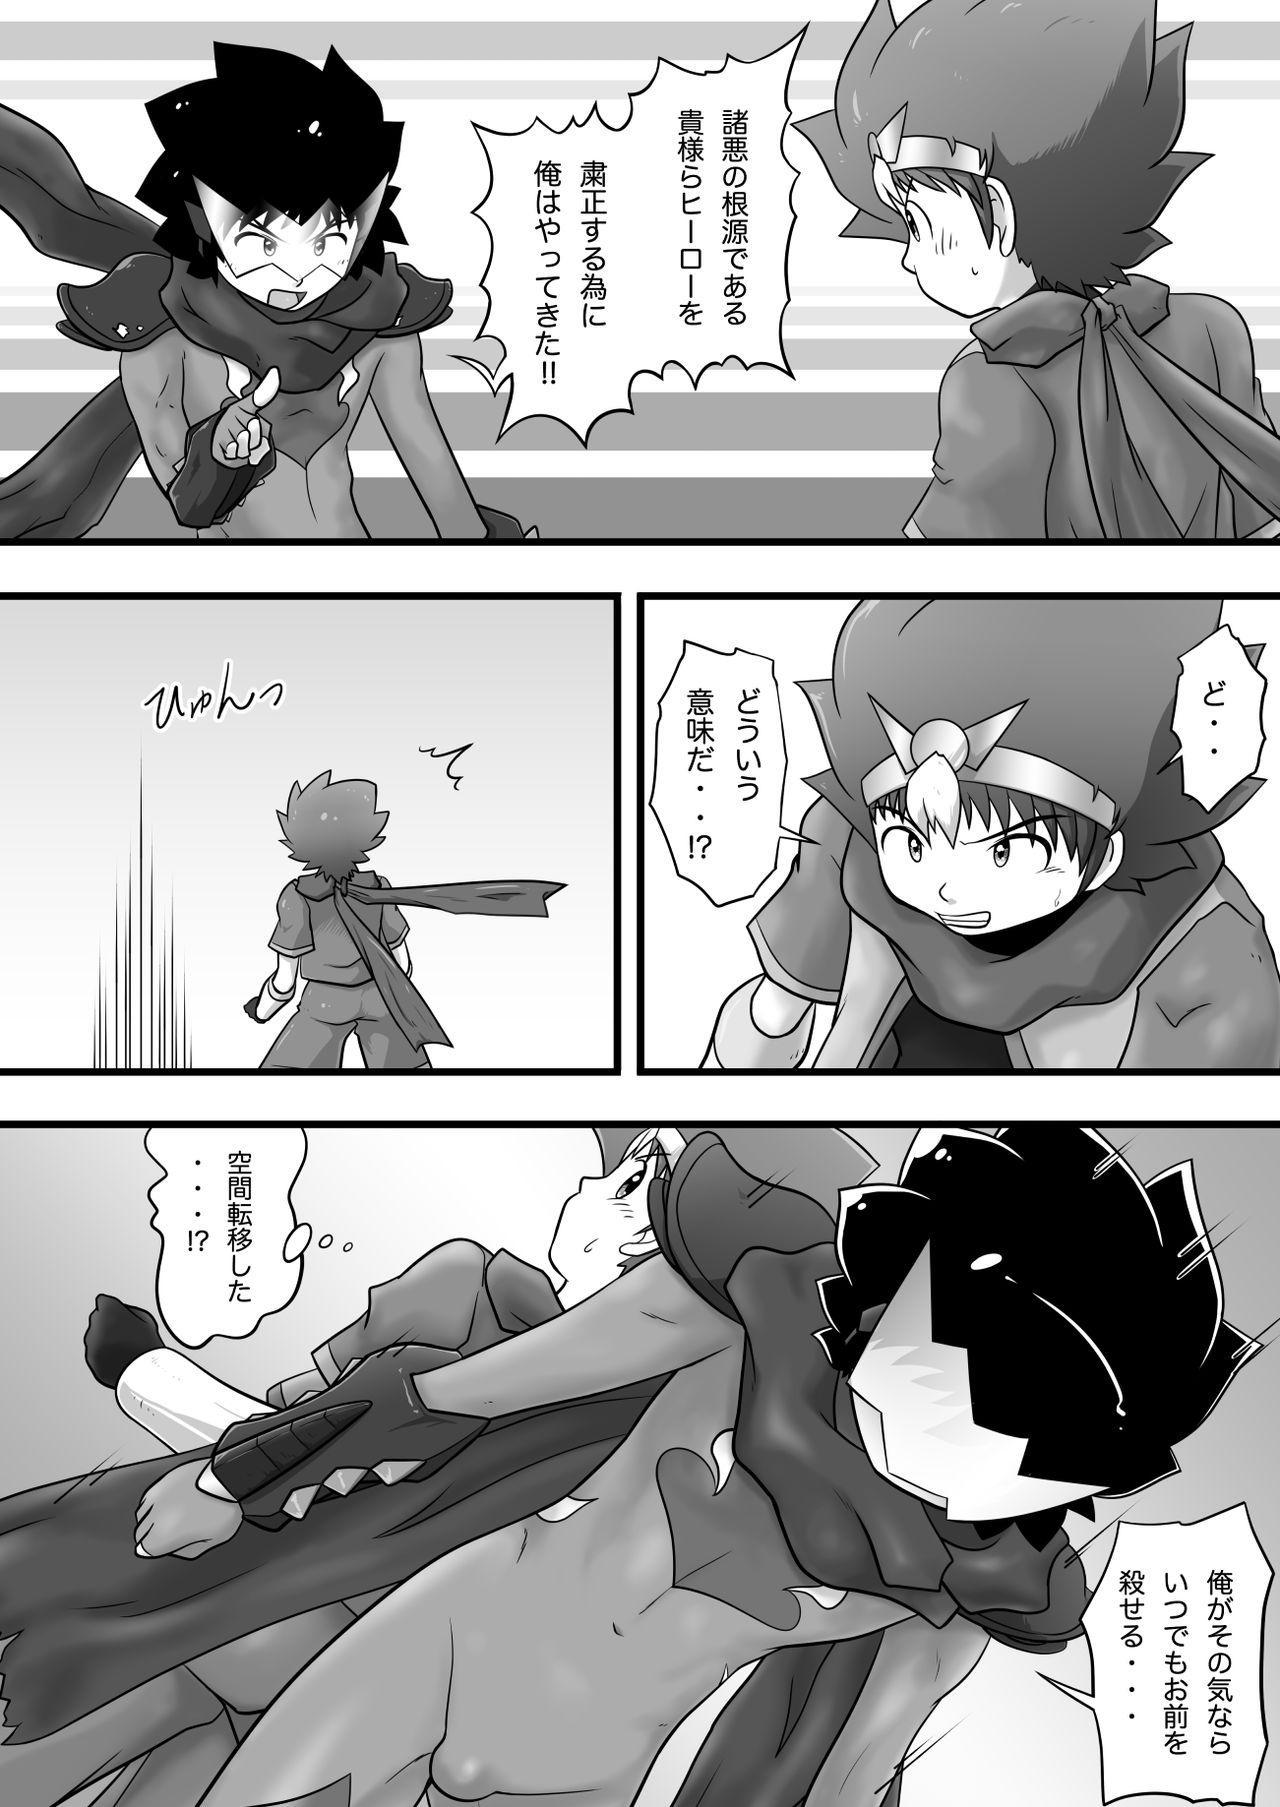 Chrono Kid TSURUGI VS Enboy 7